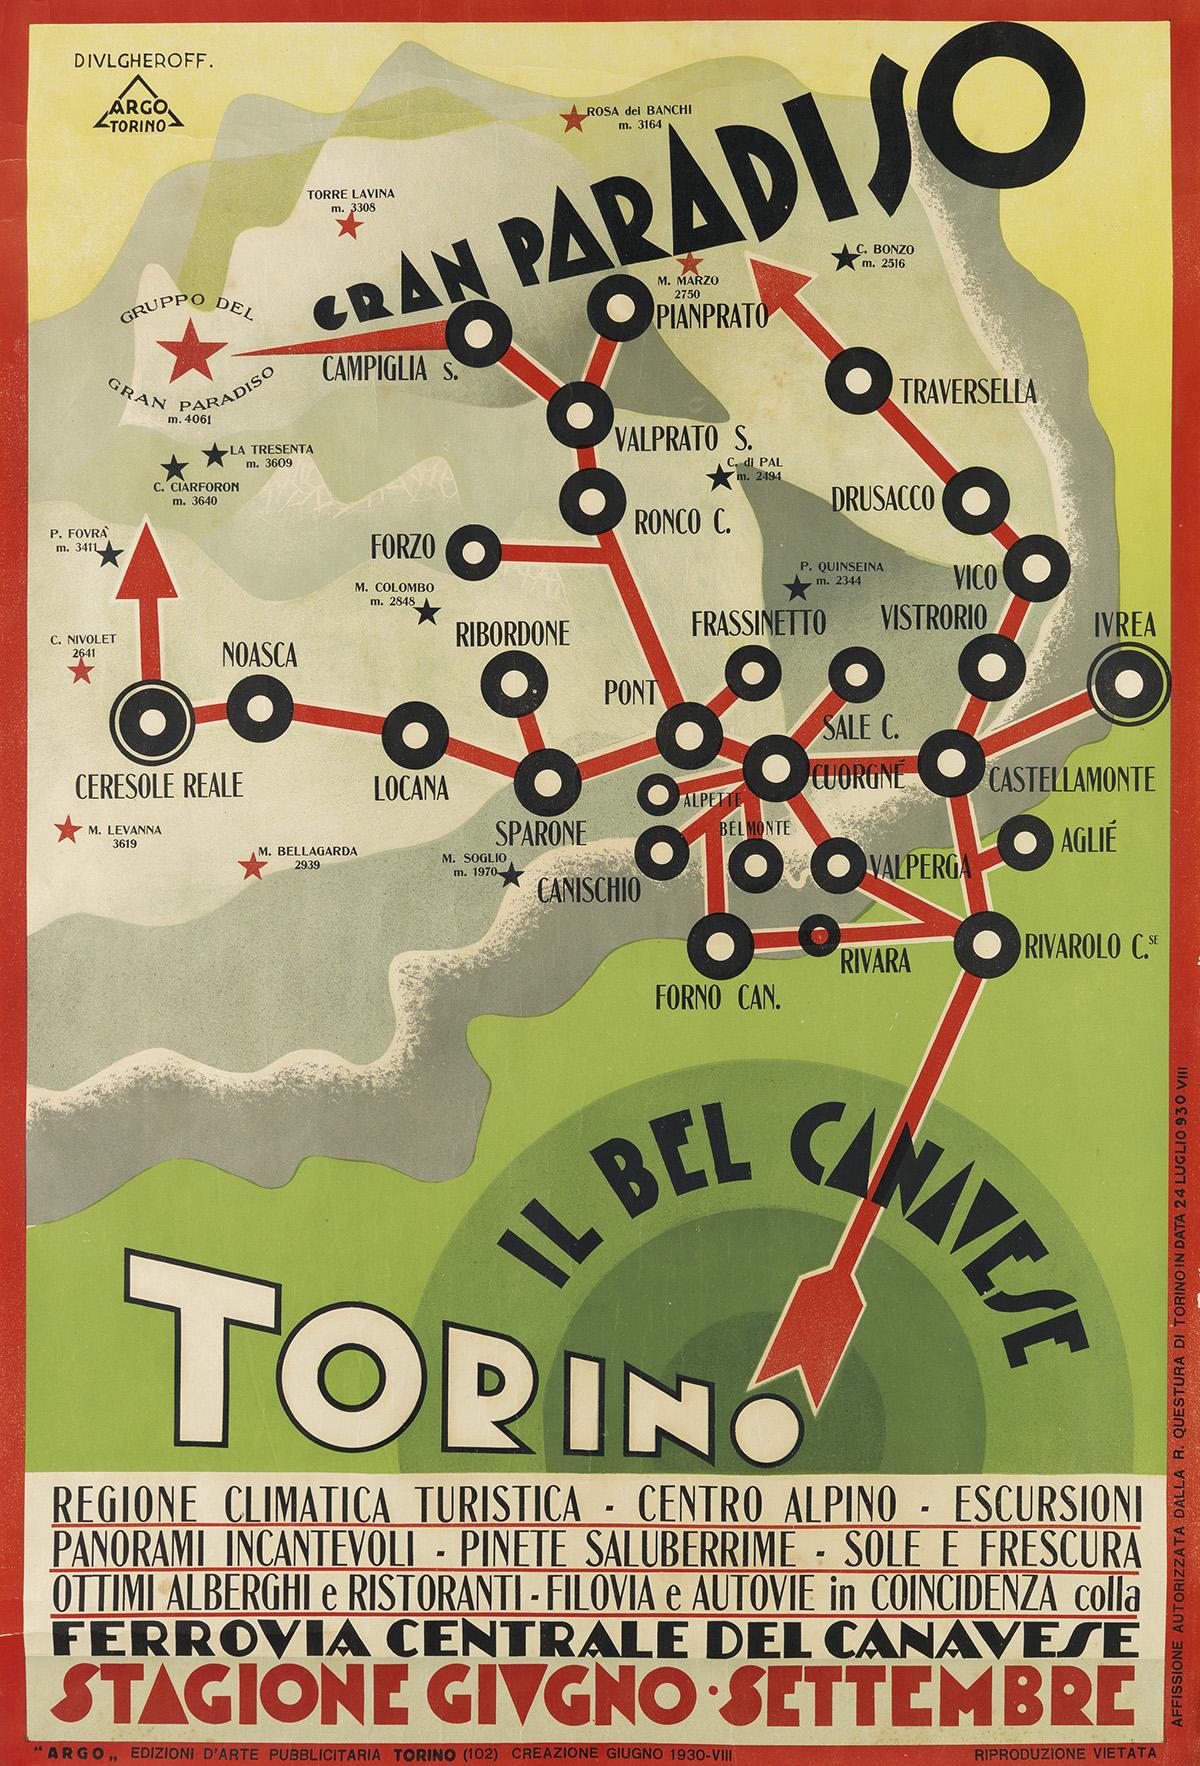 NIKOLAY-DIULGHEROFF-(1901-1982)-TORINO--IL-BEL-CANAVESE-1930